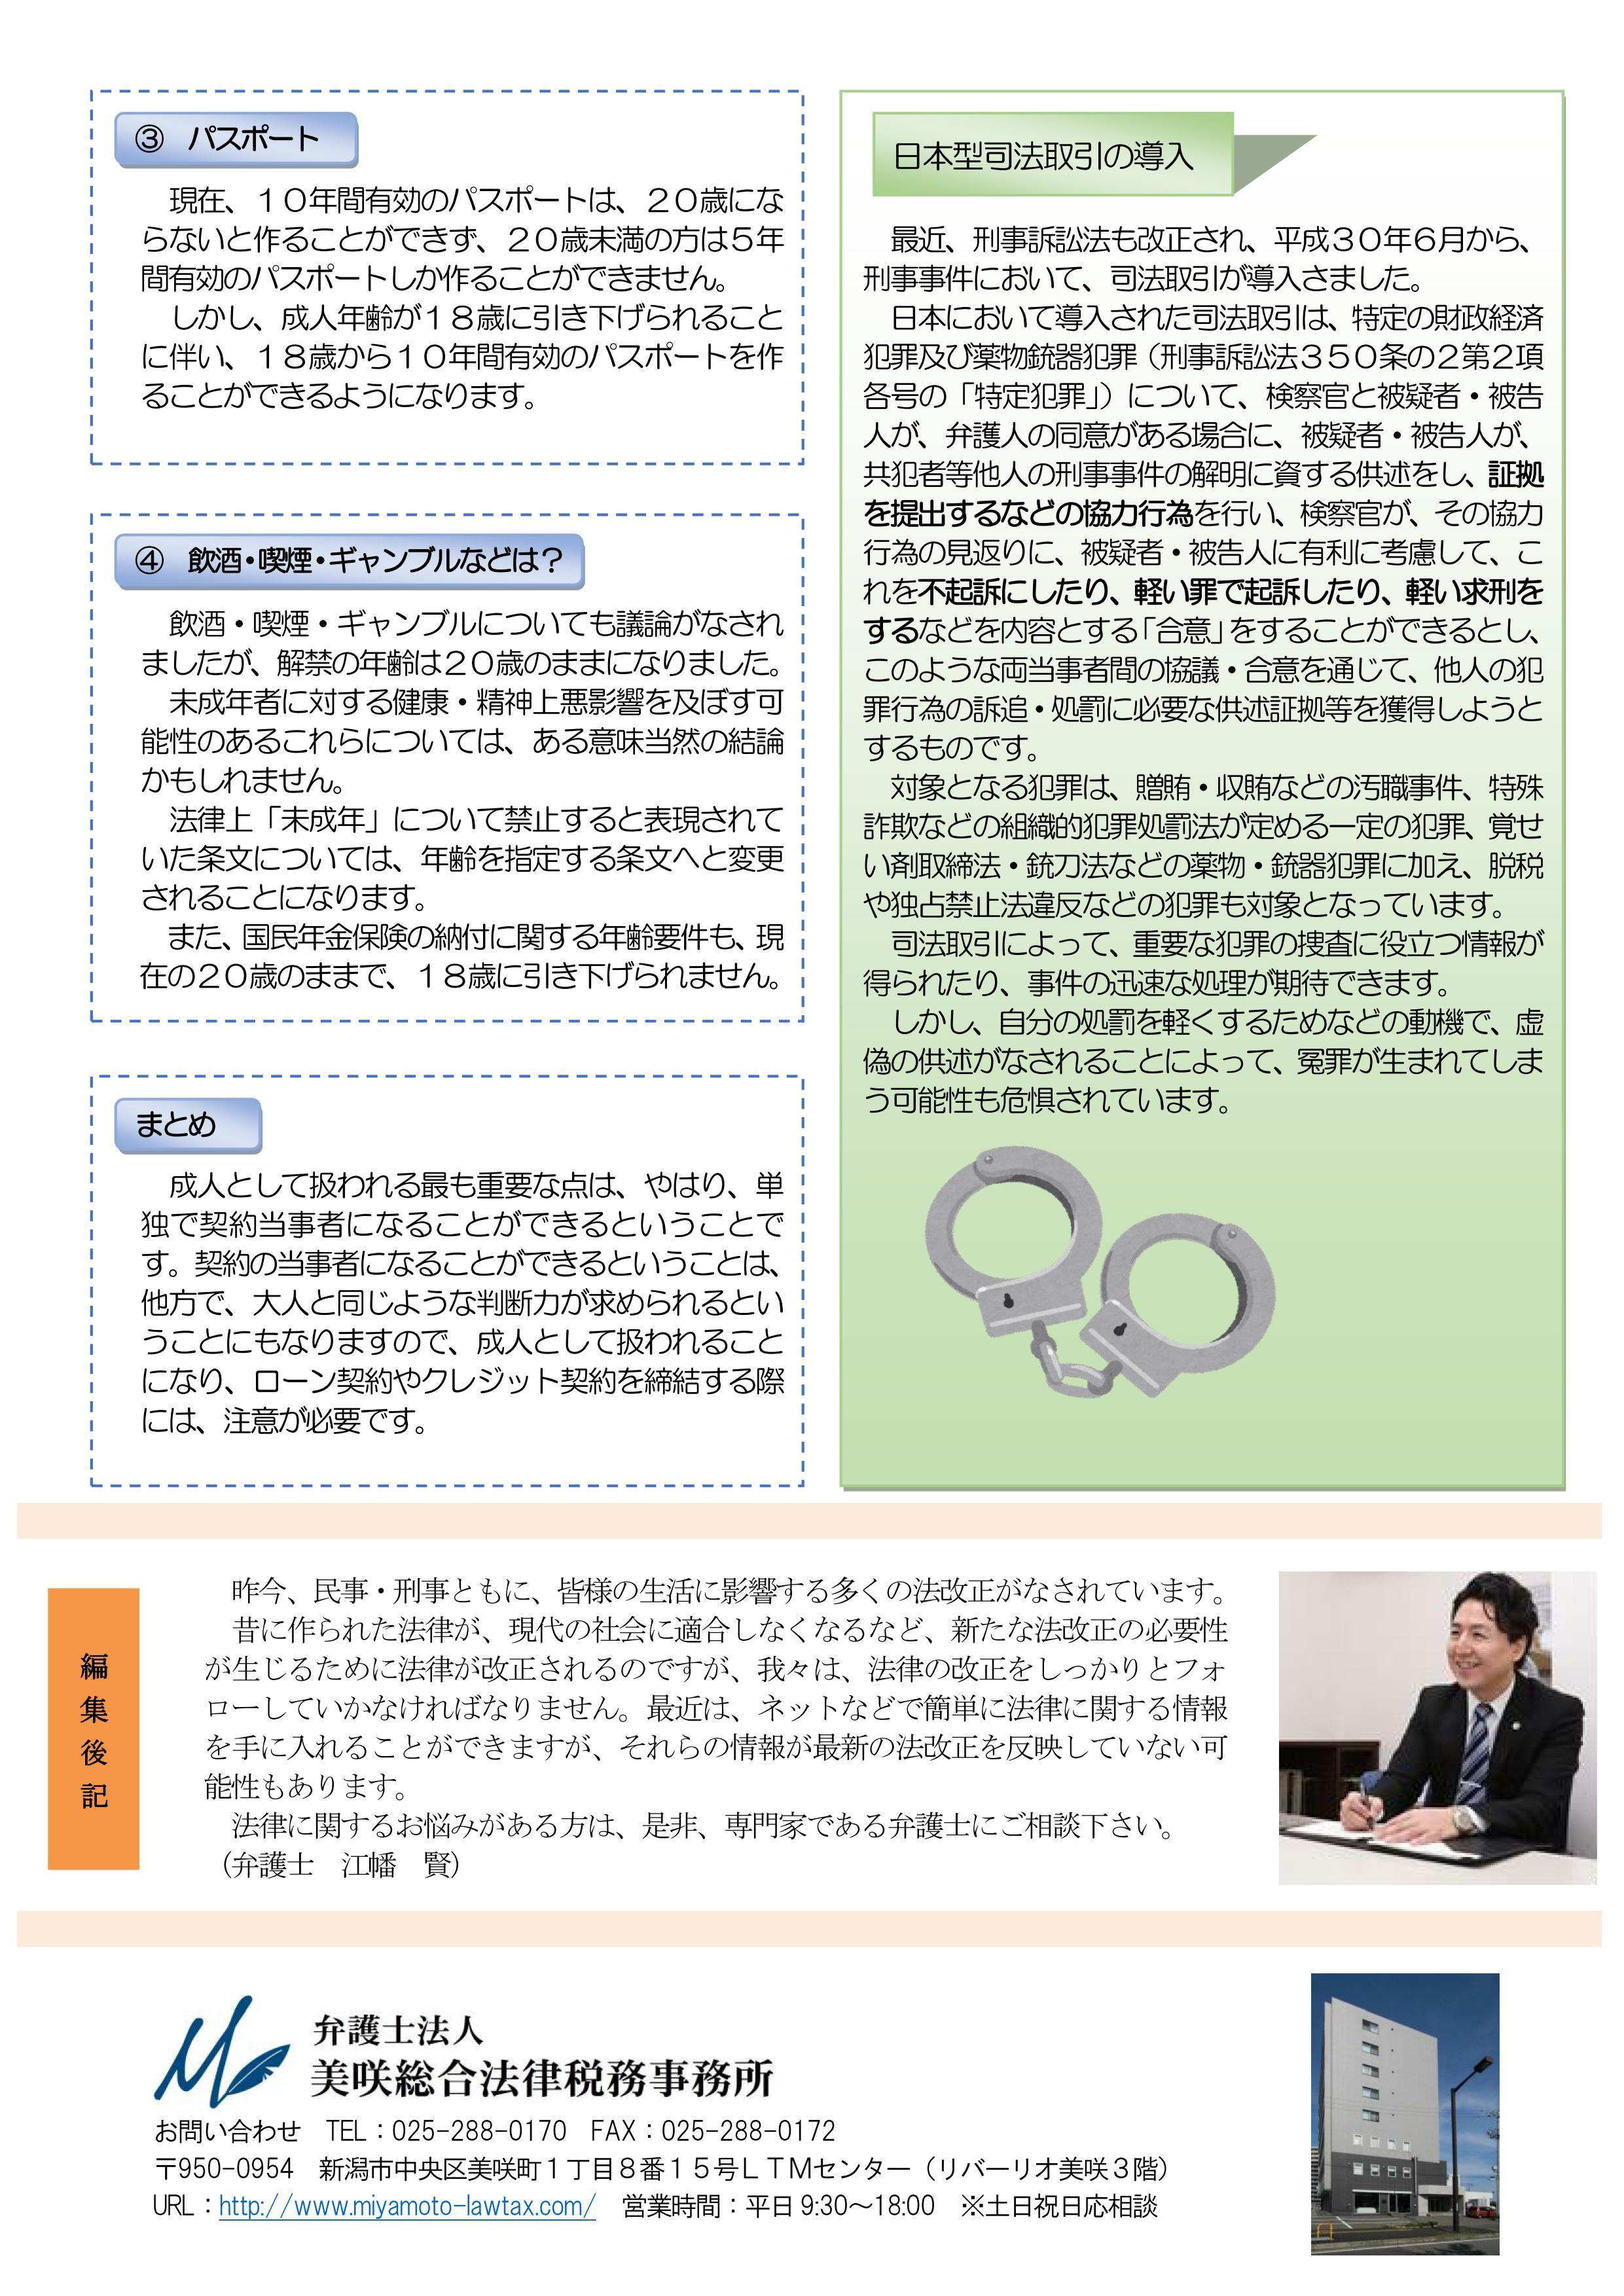 H300806 ニュースレター Vol.16_02.jpg